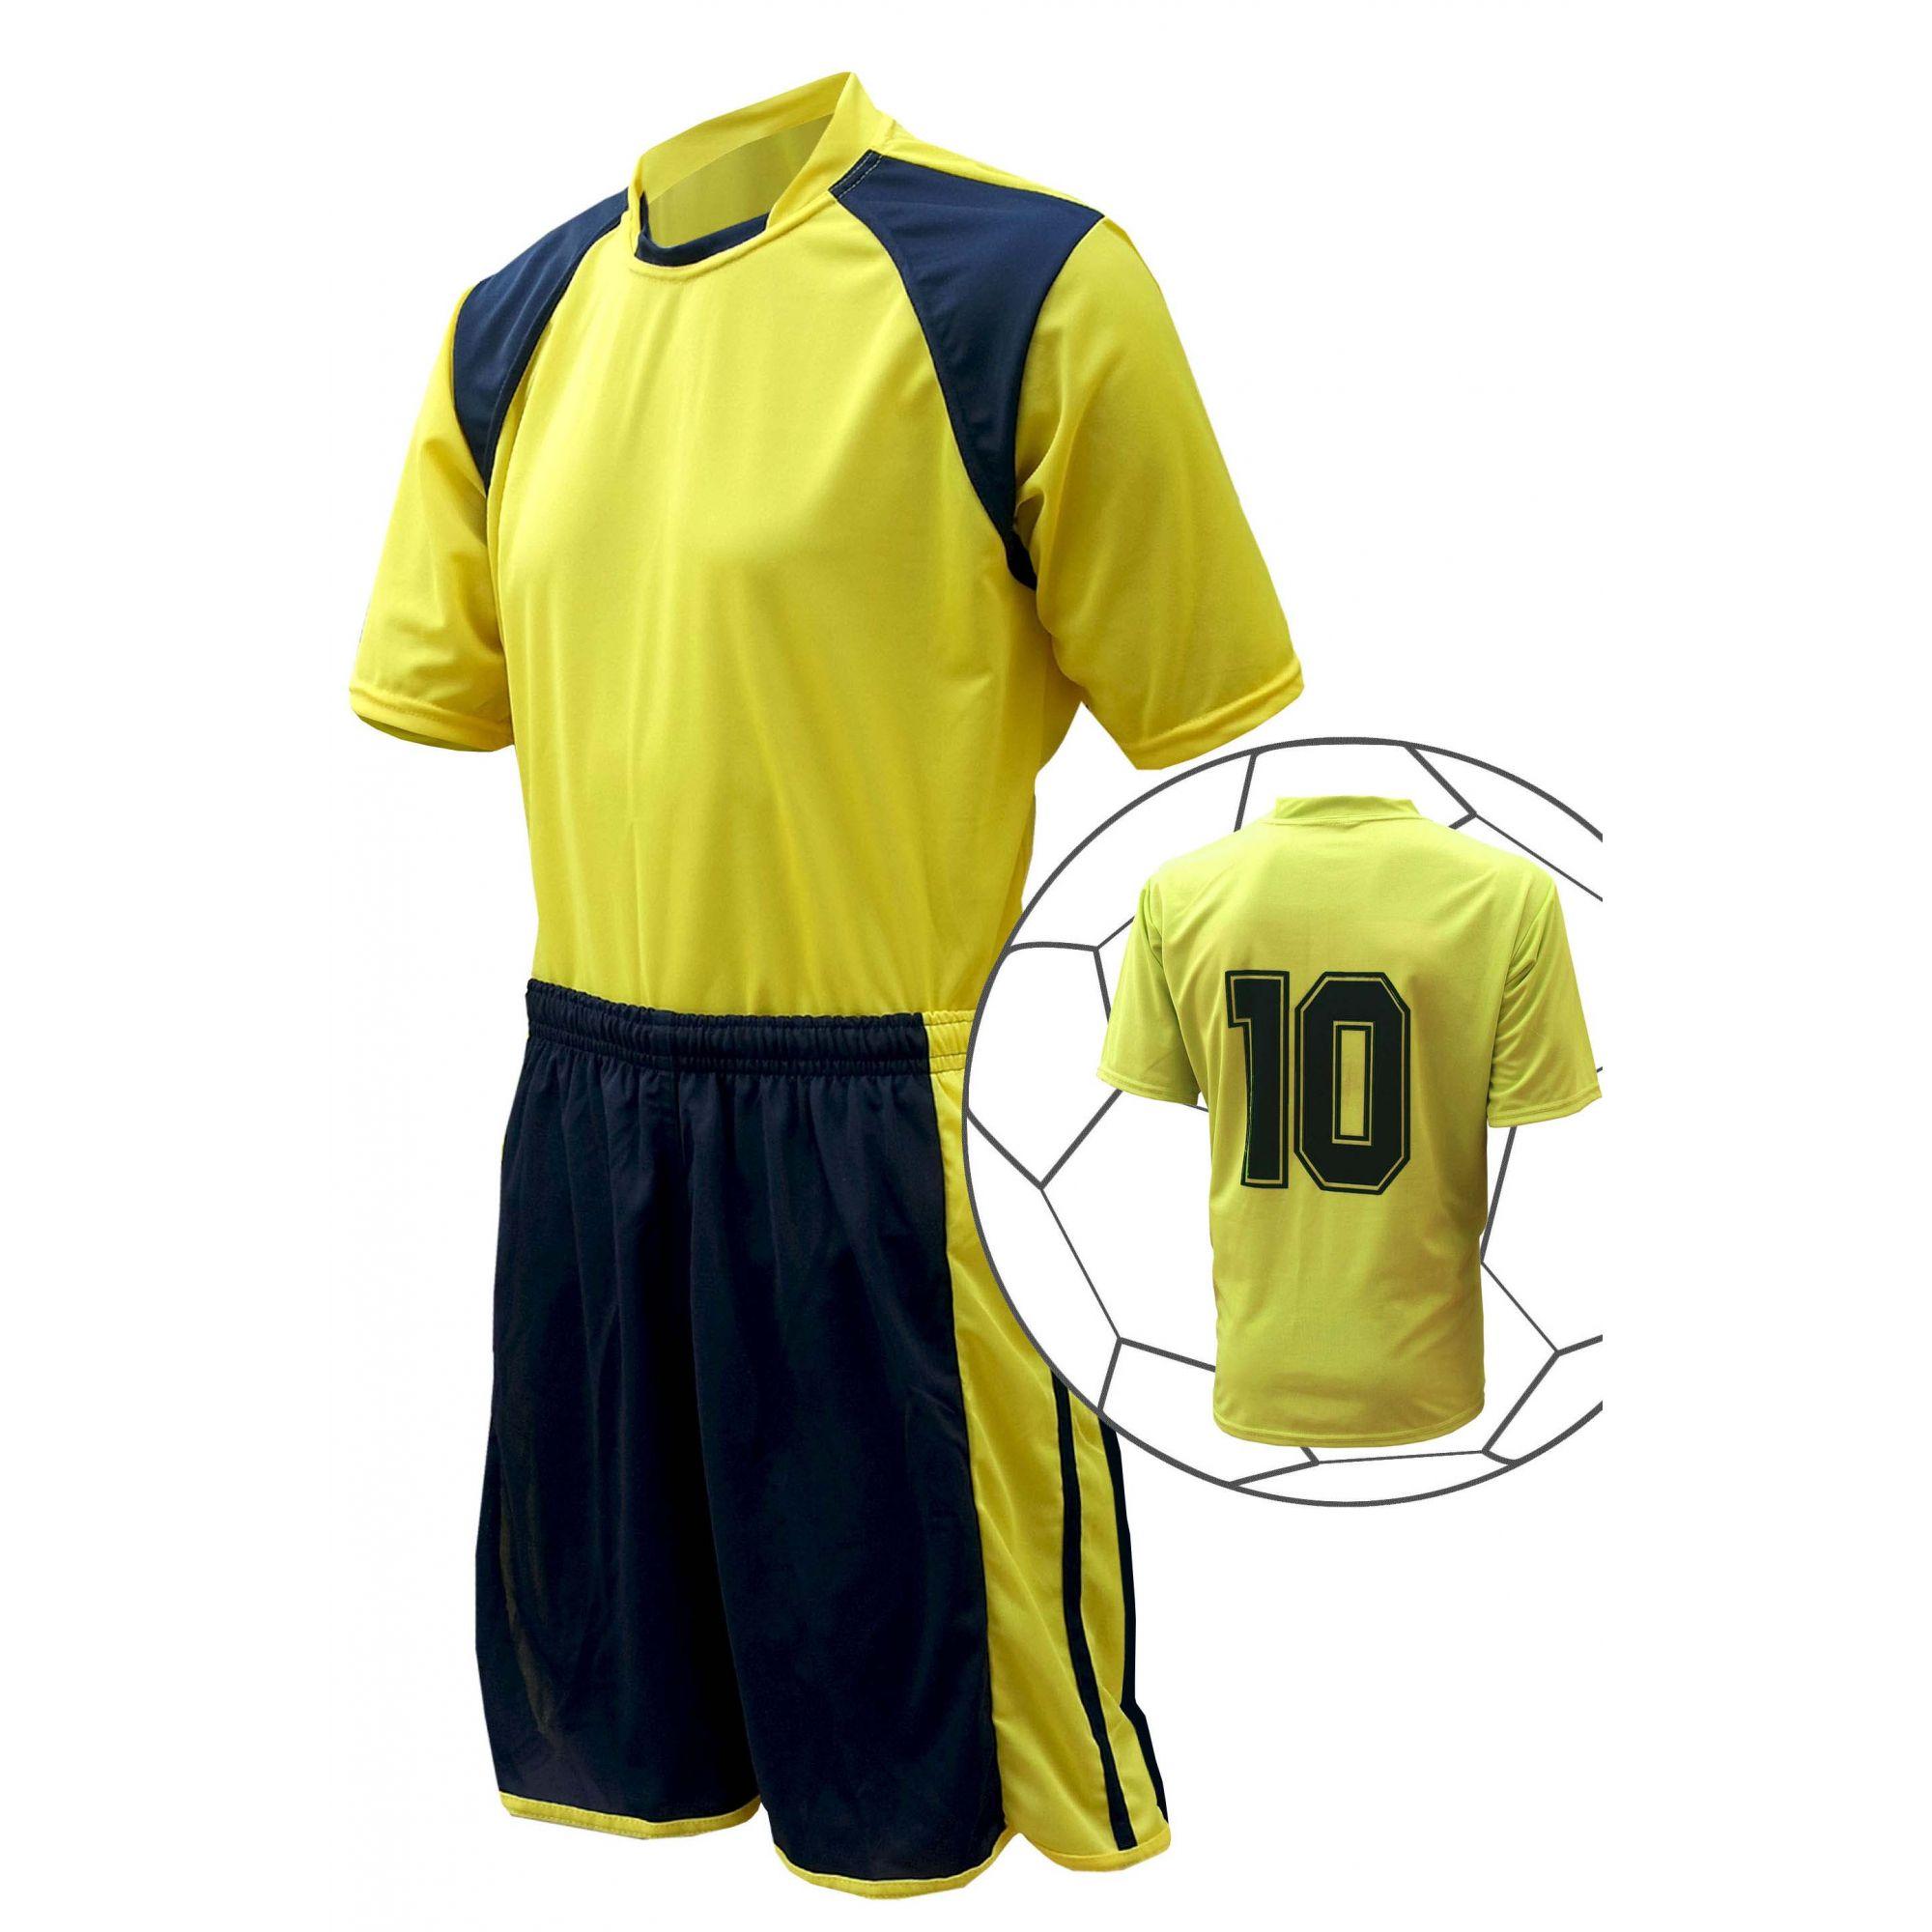 Uniforme de Futebol 5 + 1 Avante Ligth